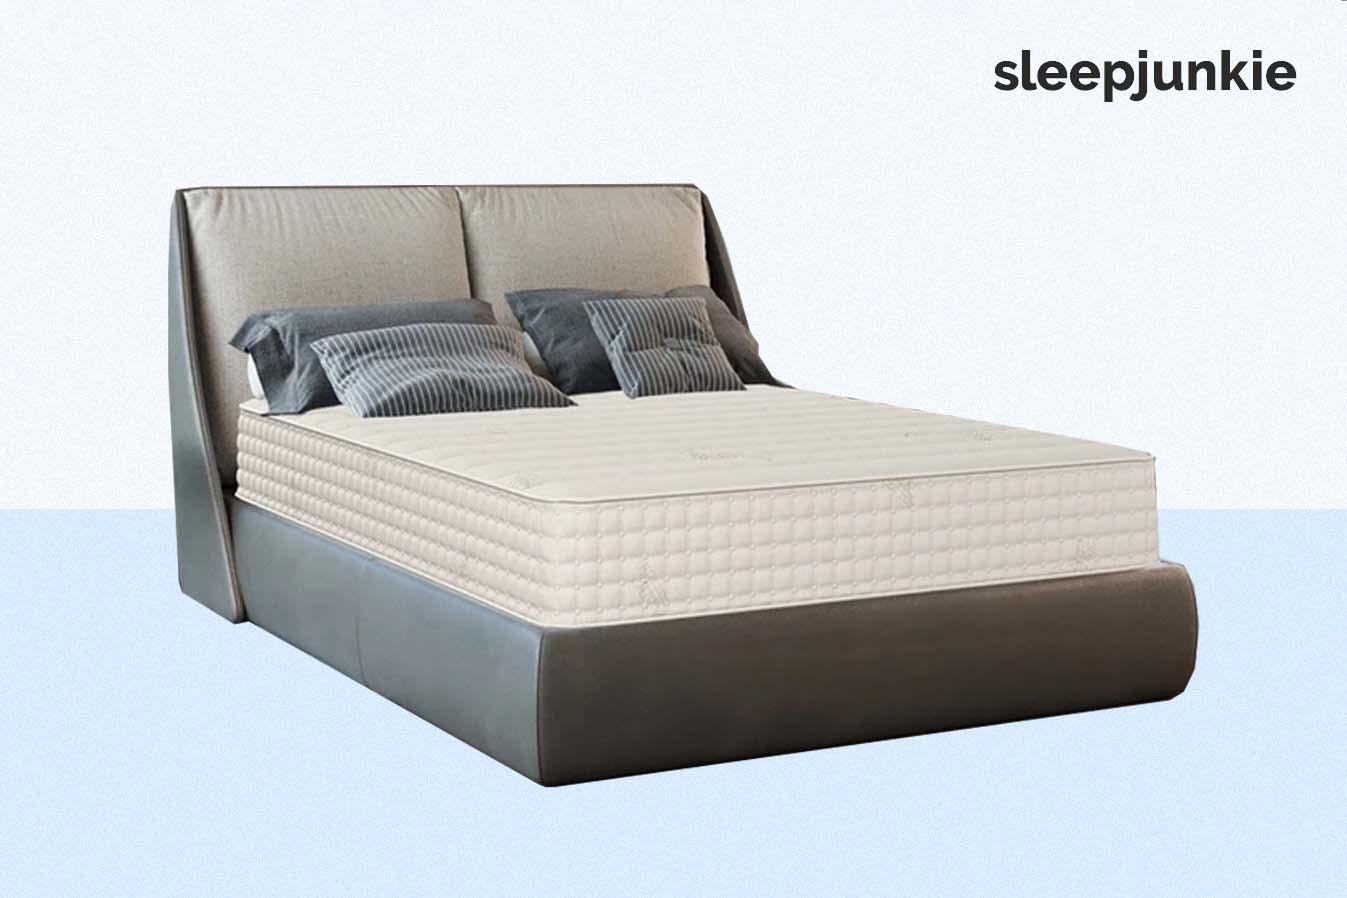 plushbeds mattress